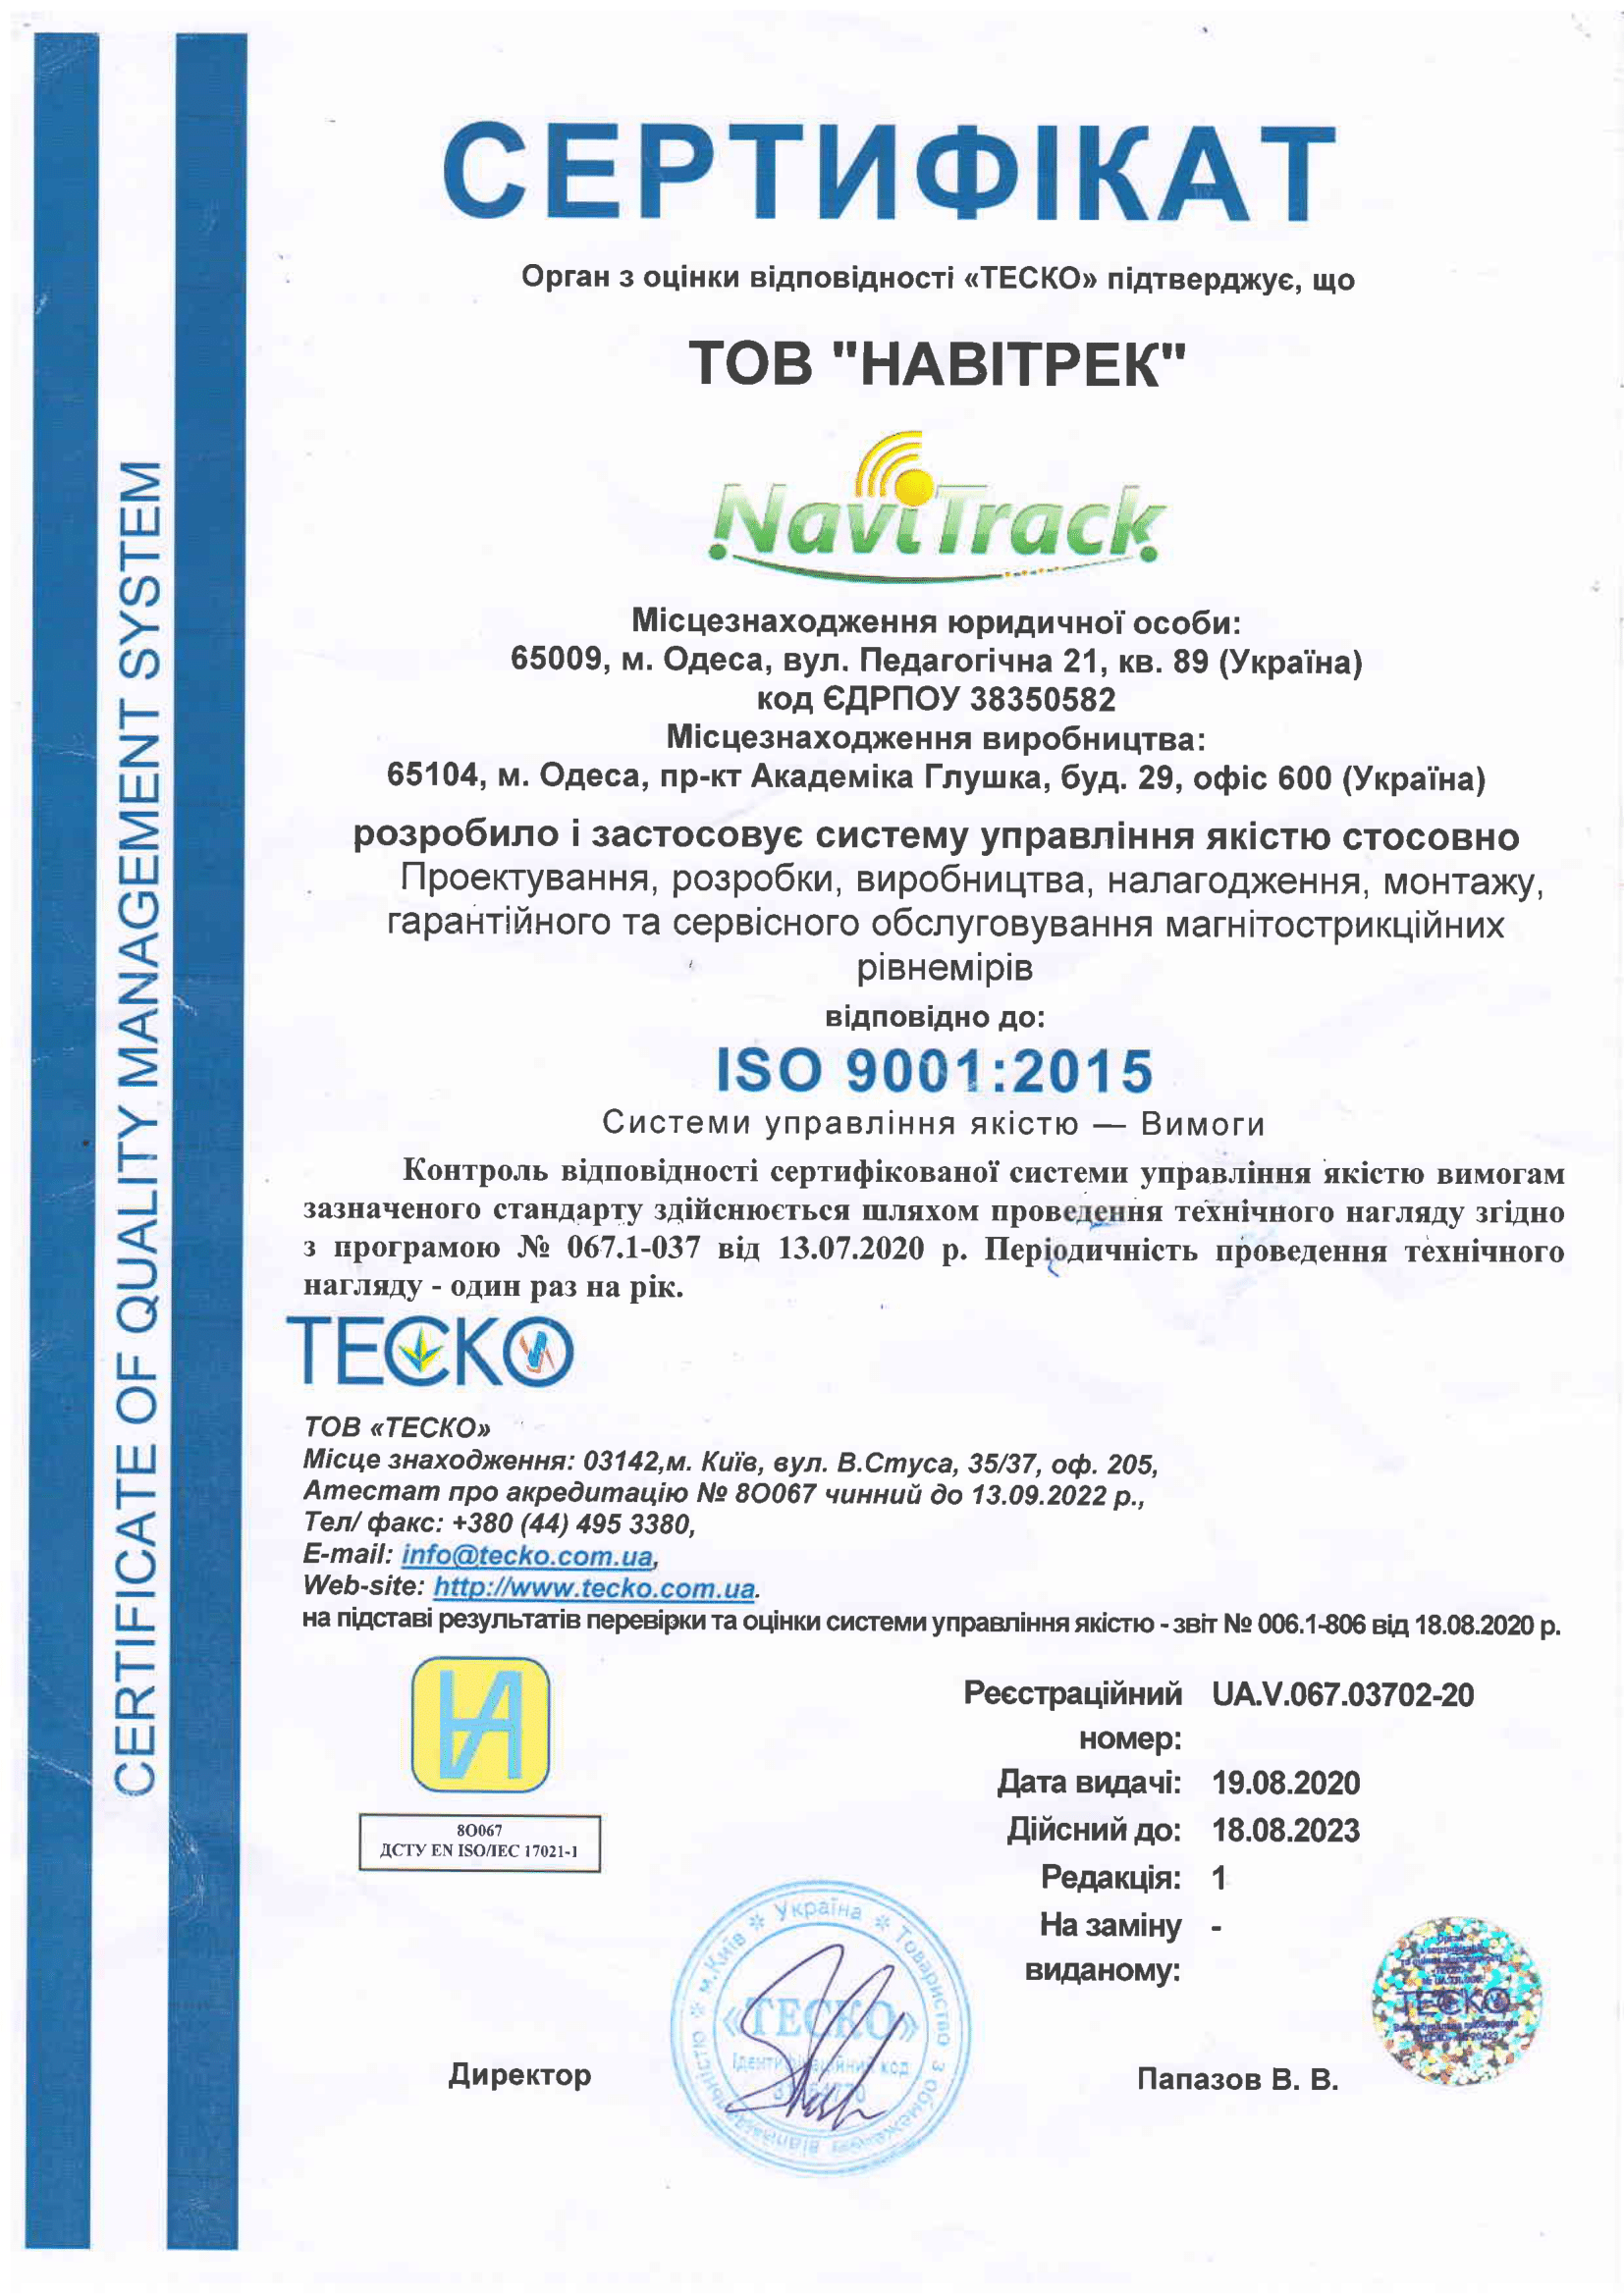 Сертификат 9001:2015